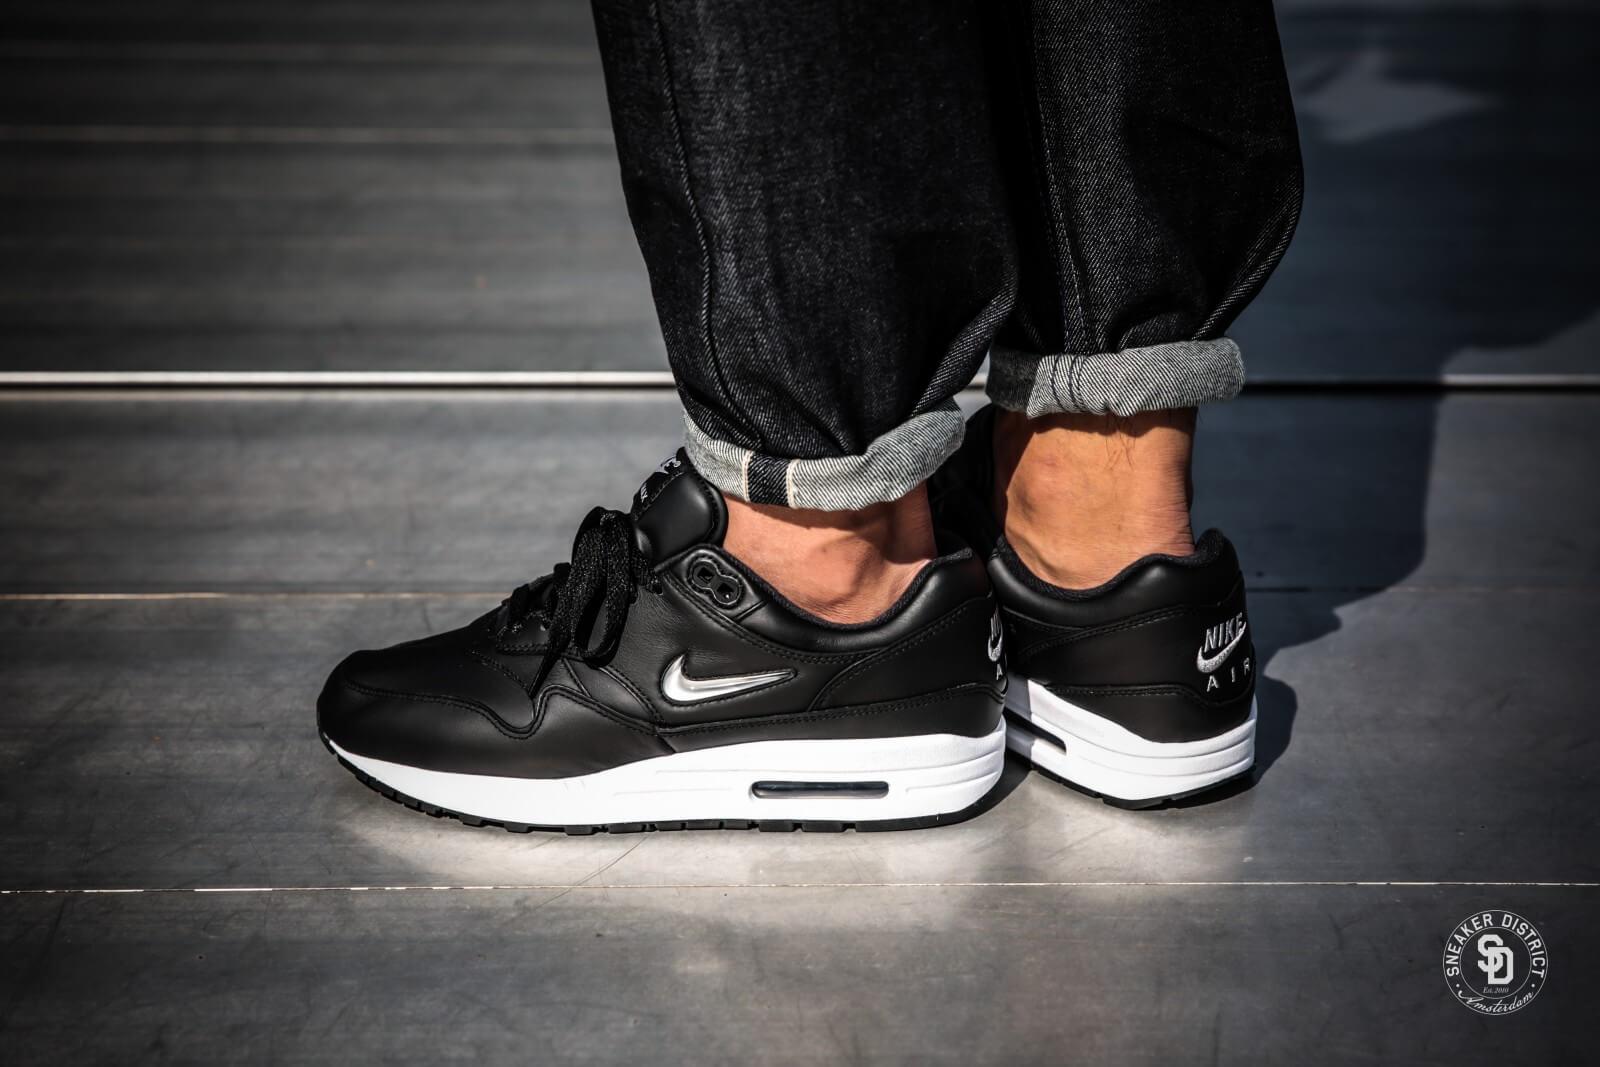 Nike Air Max 1 Premium SC Black/Metallic Silver-White